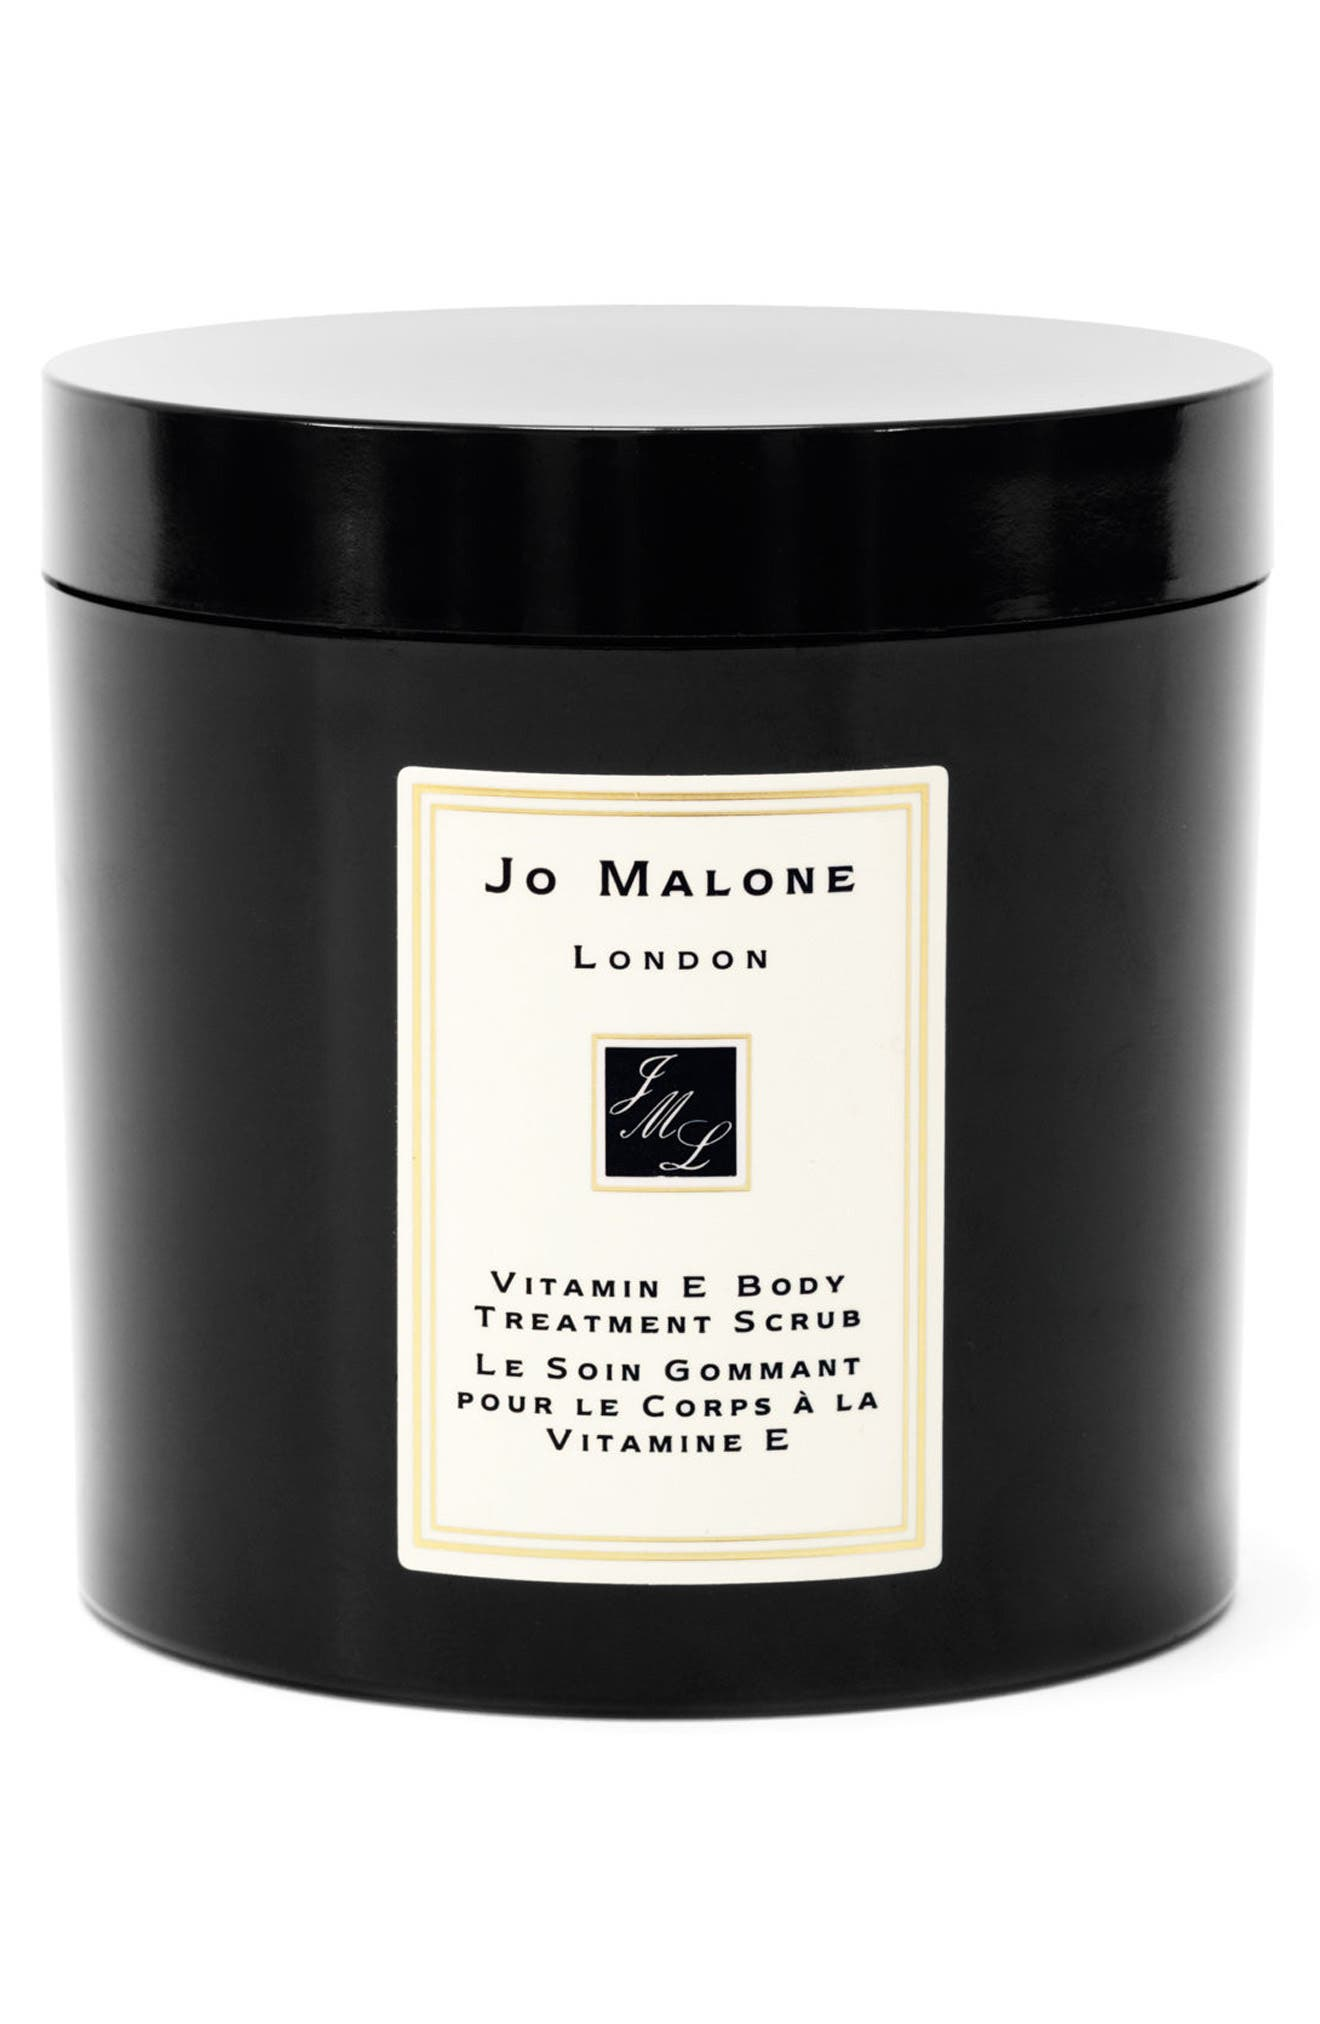 Alternate Image 1 Selected - Jo Malone London™ 'Vitamin E' Body Treatment Scrub